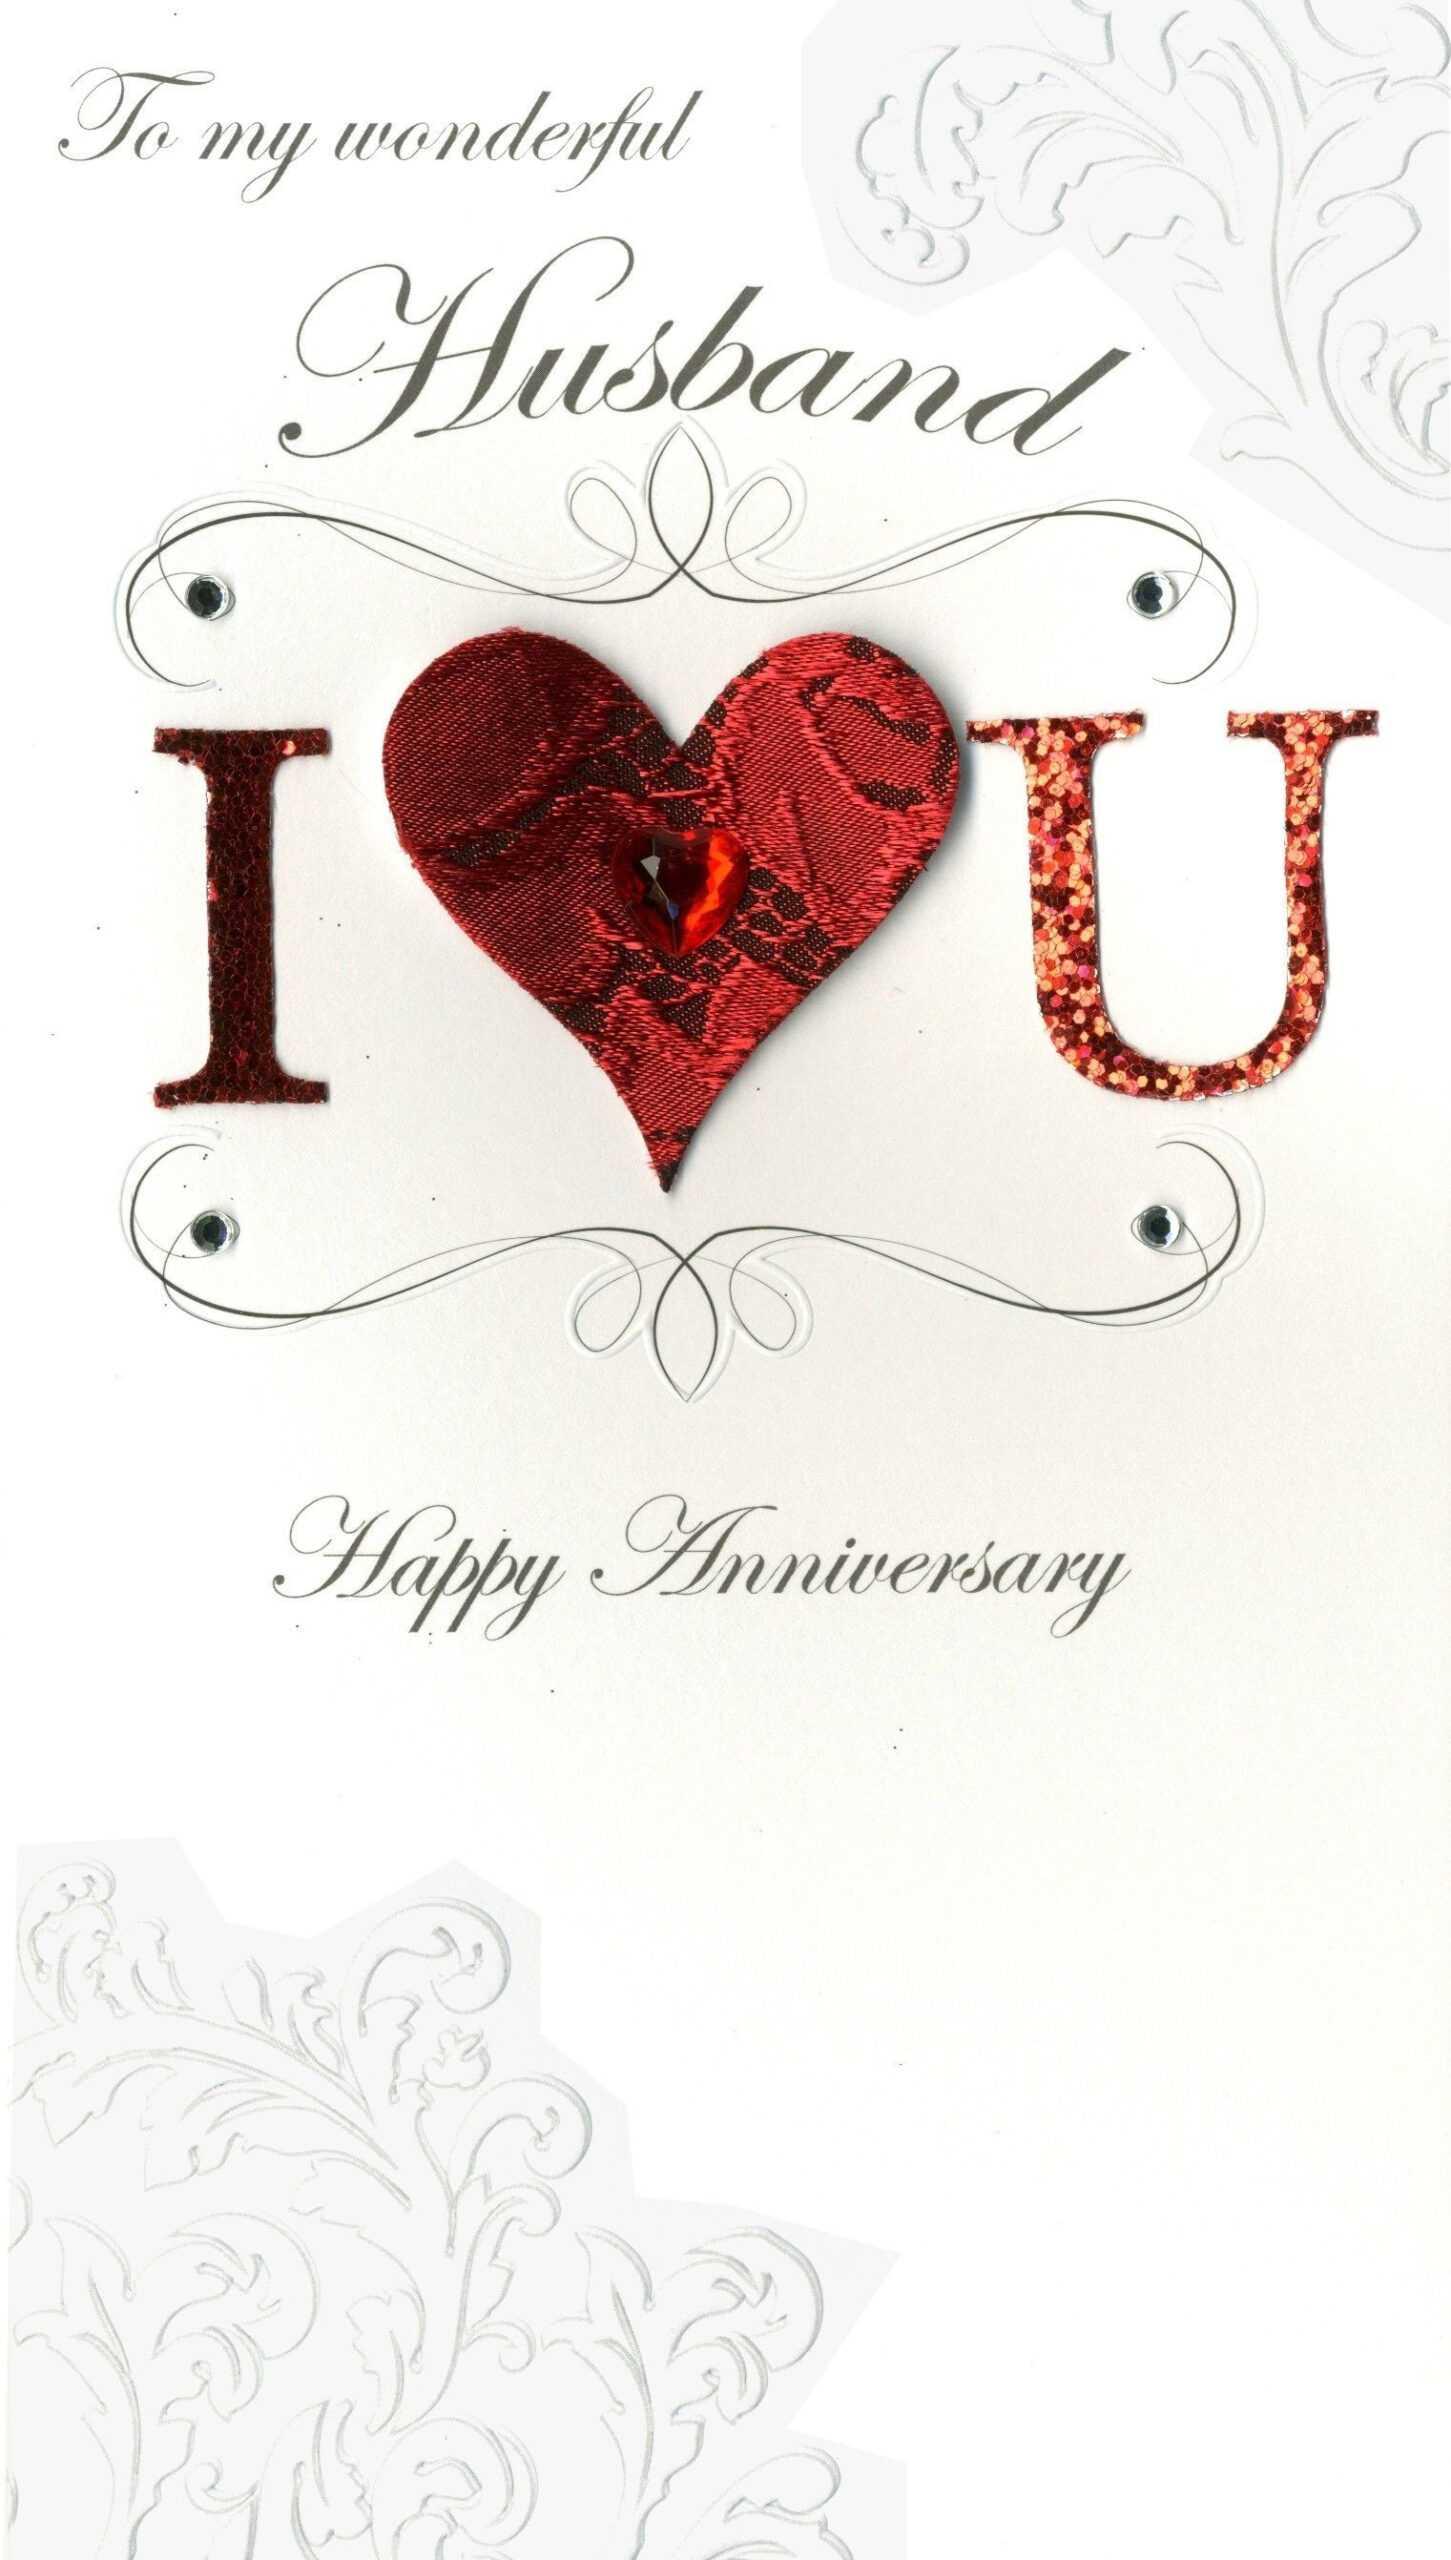 Anniversary Card Template For Word - Karan.ald2014 With Word Anniversary Card Template